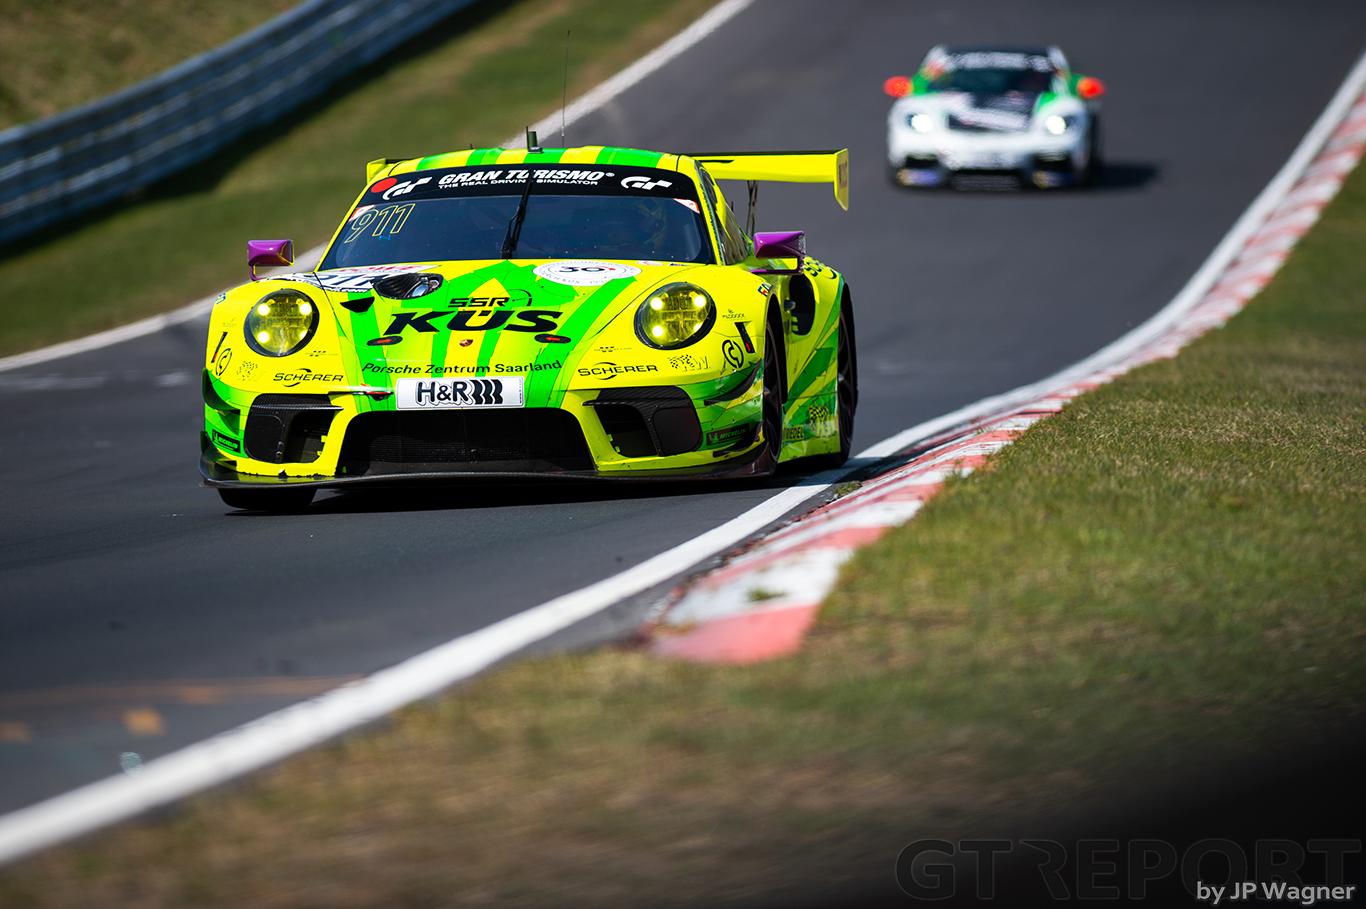 VLN Nürburgring Endurance Series NLS2 race report: Manthey wins close Porsche battle with Frikadelli